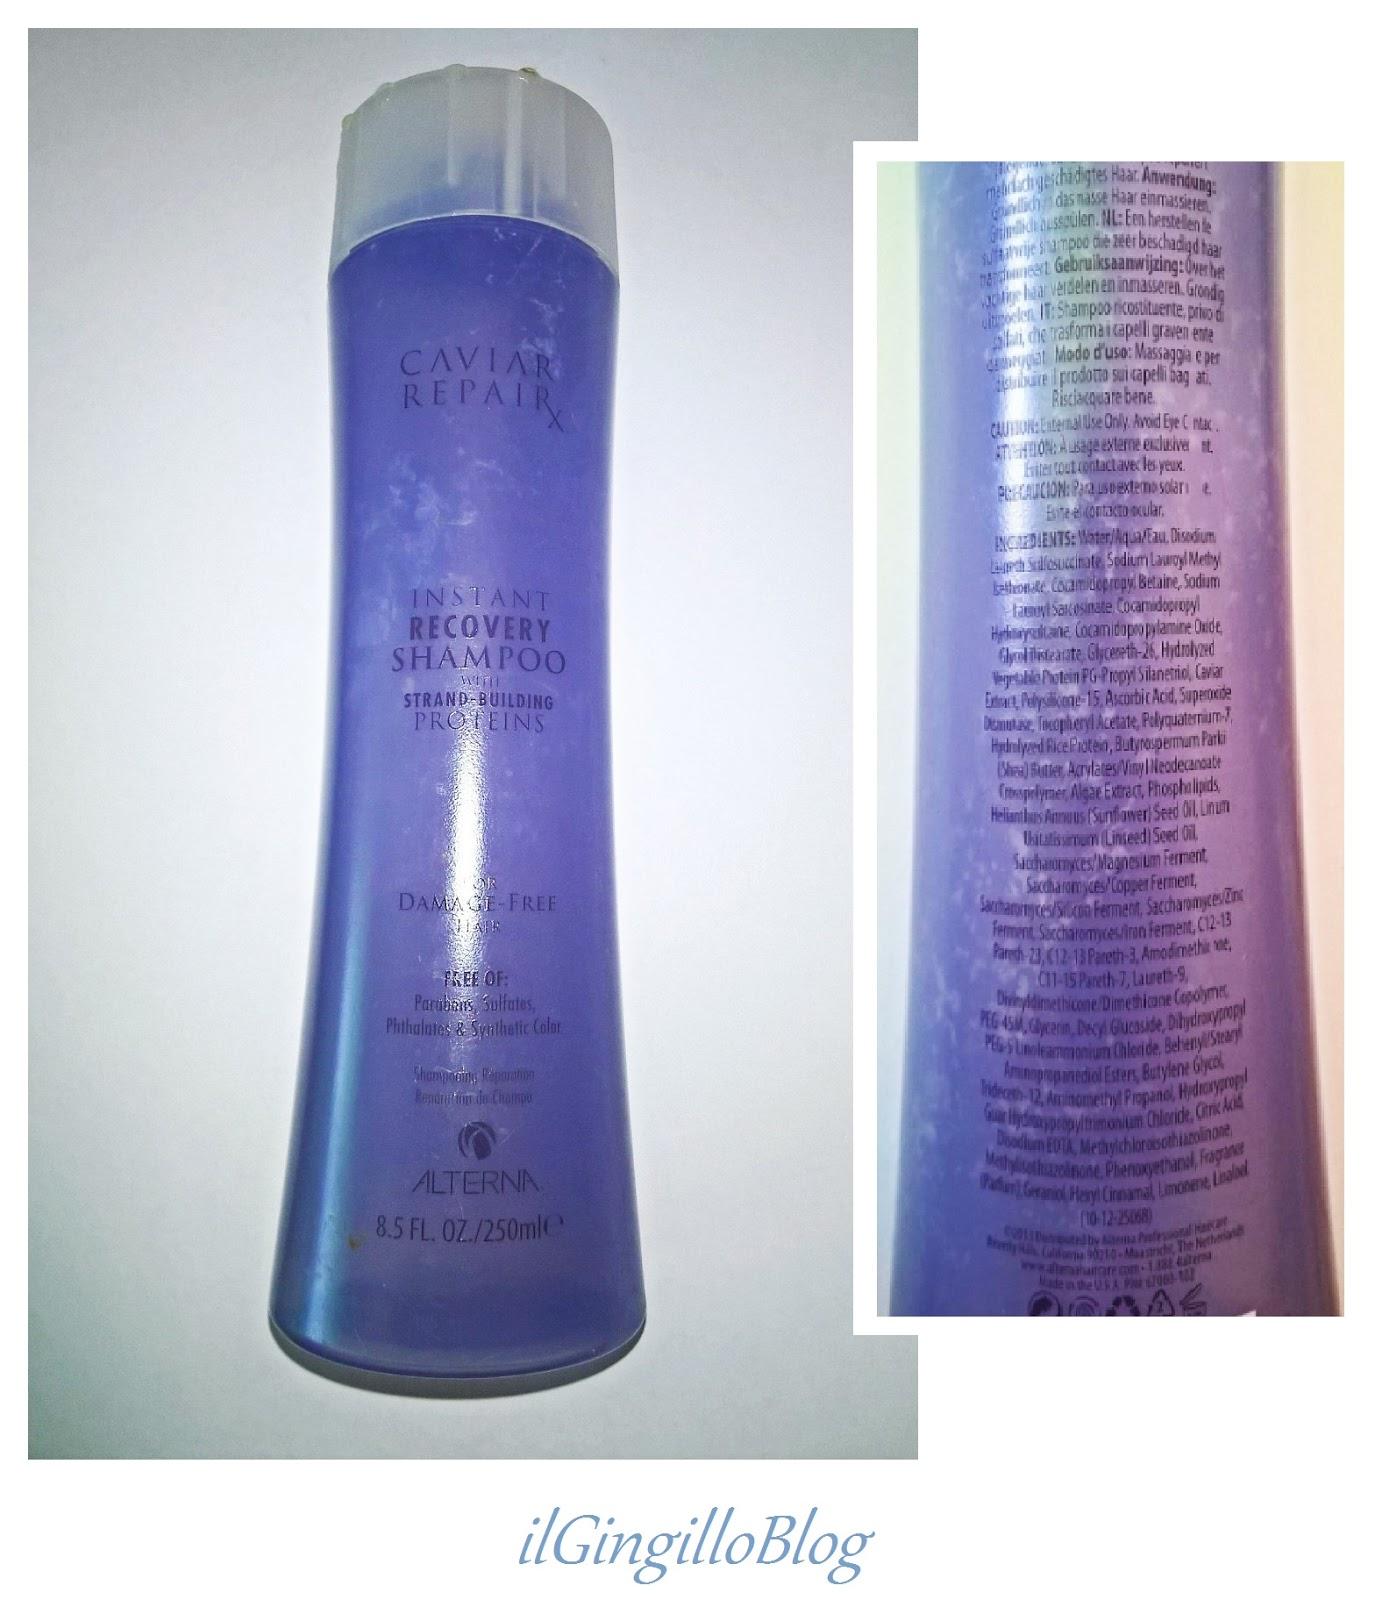 il gingillo blog instant recovery shampoo caviar repair alterna review. Black Bedroom Furniture Sets. Home Design Ideas